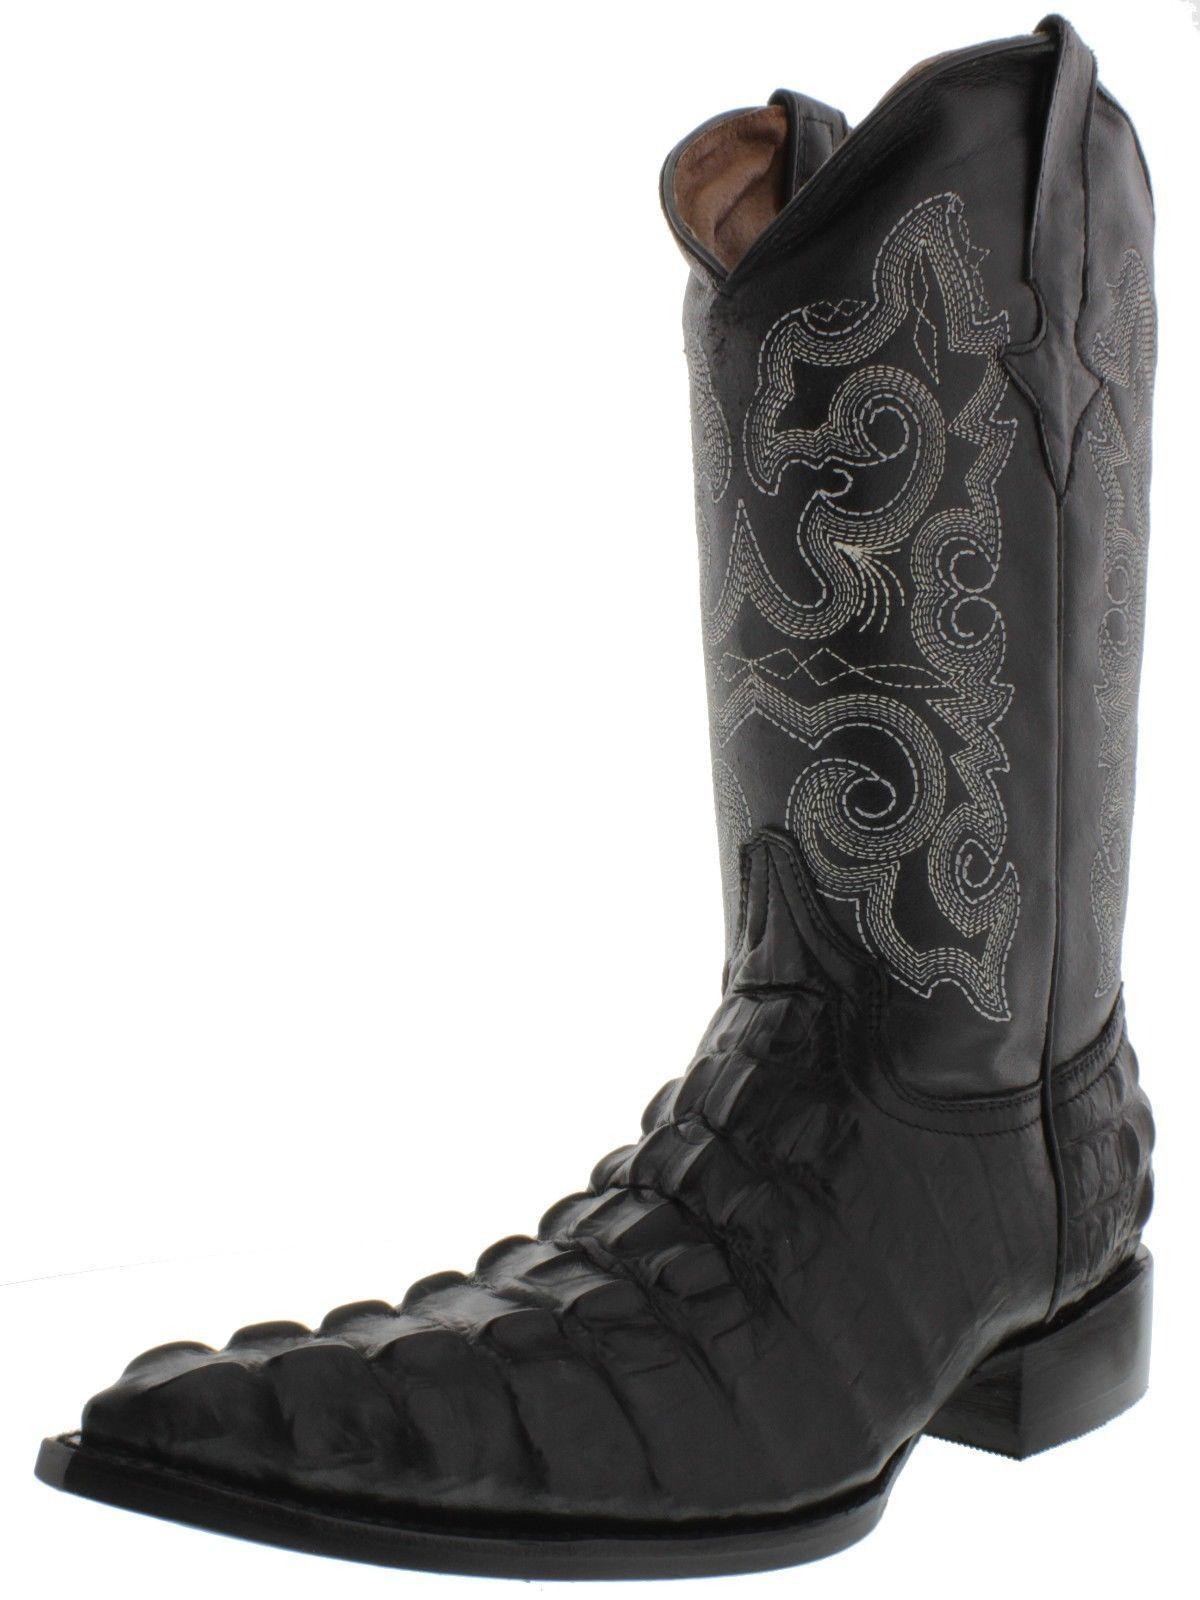 dfae94b2251 Men's cognac brown crocodile alligator leather cowboy boots j toe ...